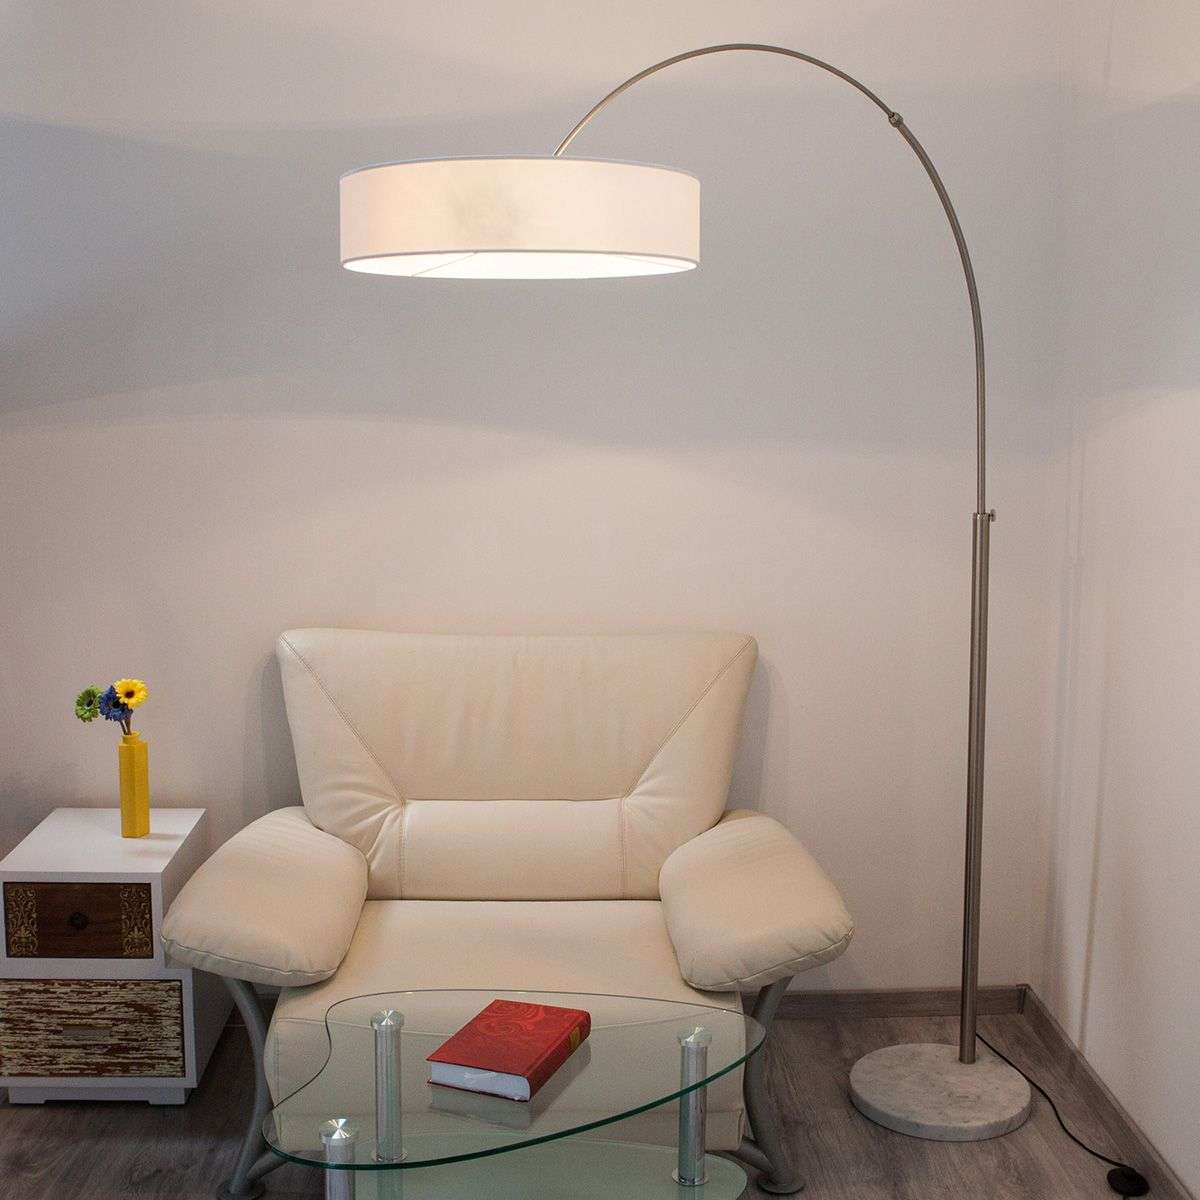 White Shing fabric floor lamp | Lights.ie